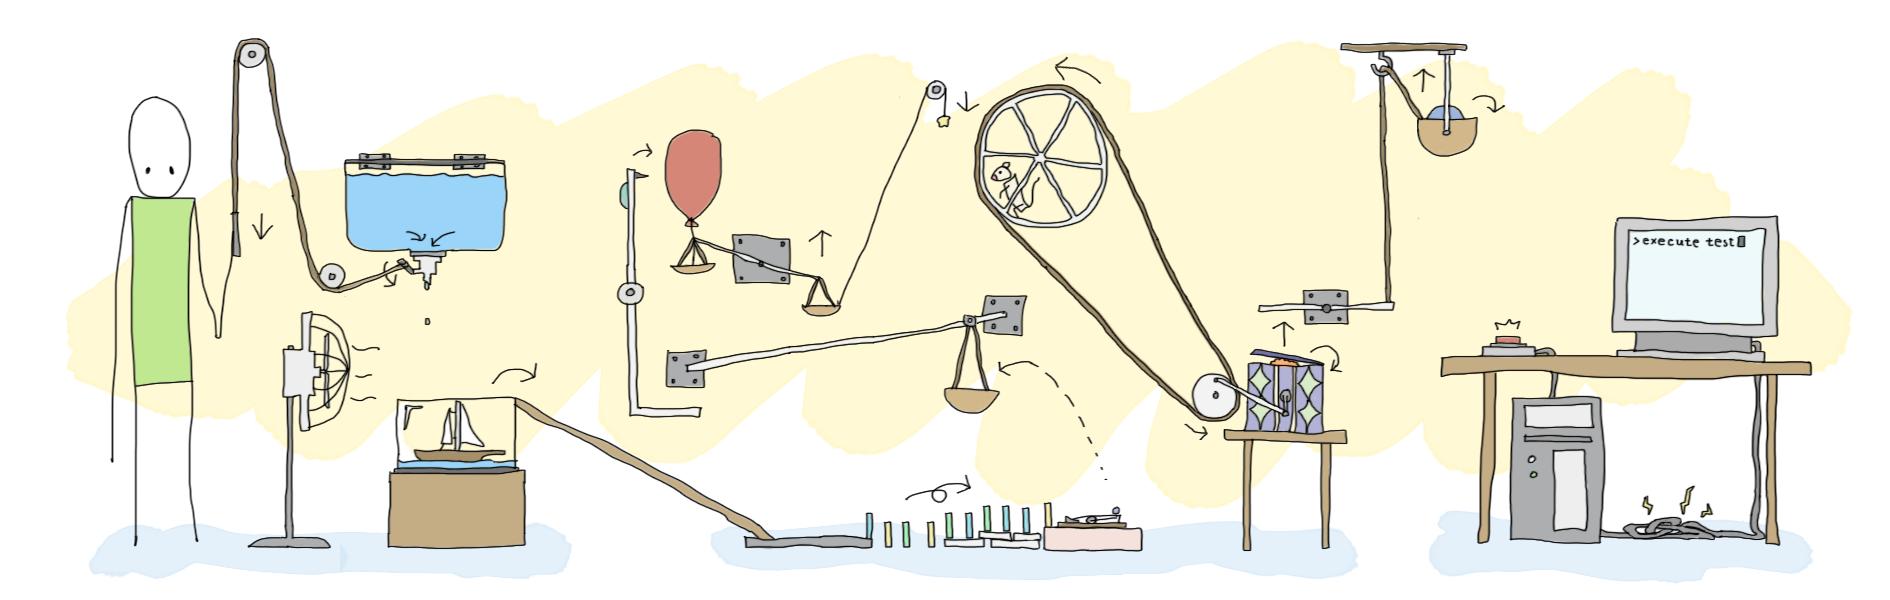 automated testing illustration